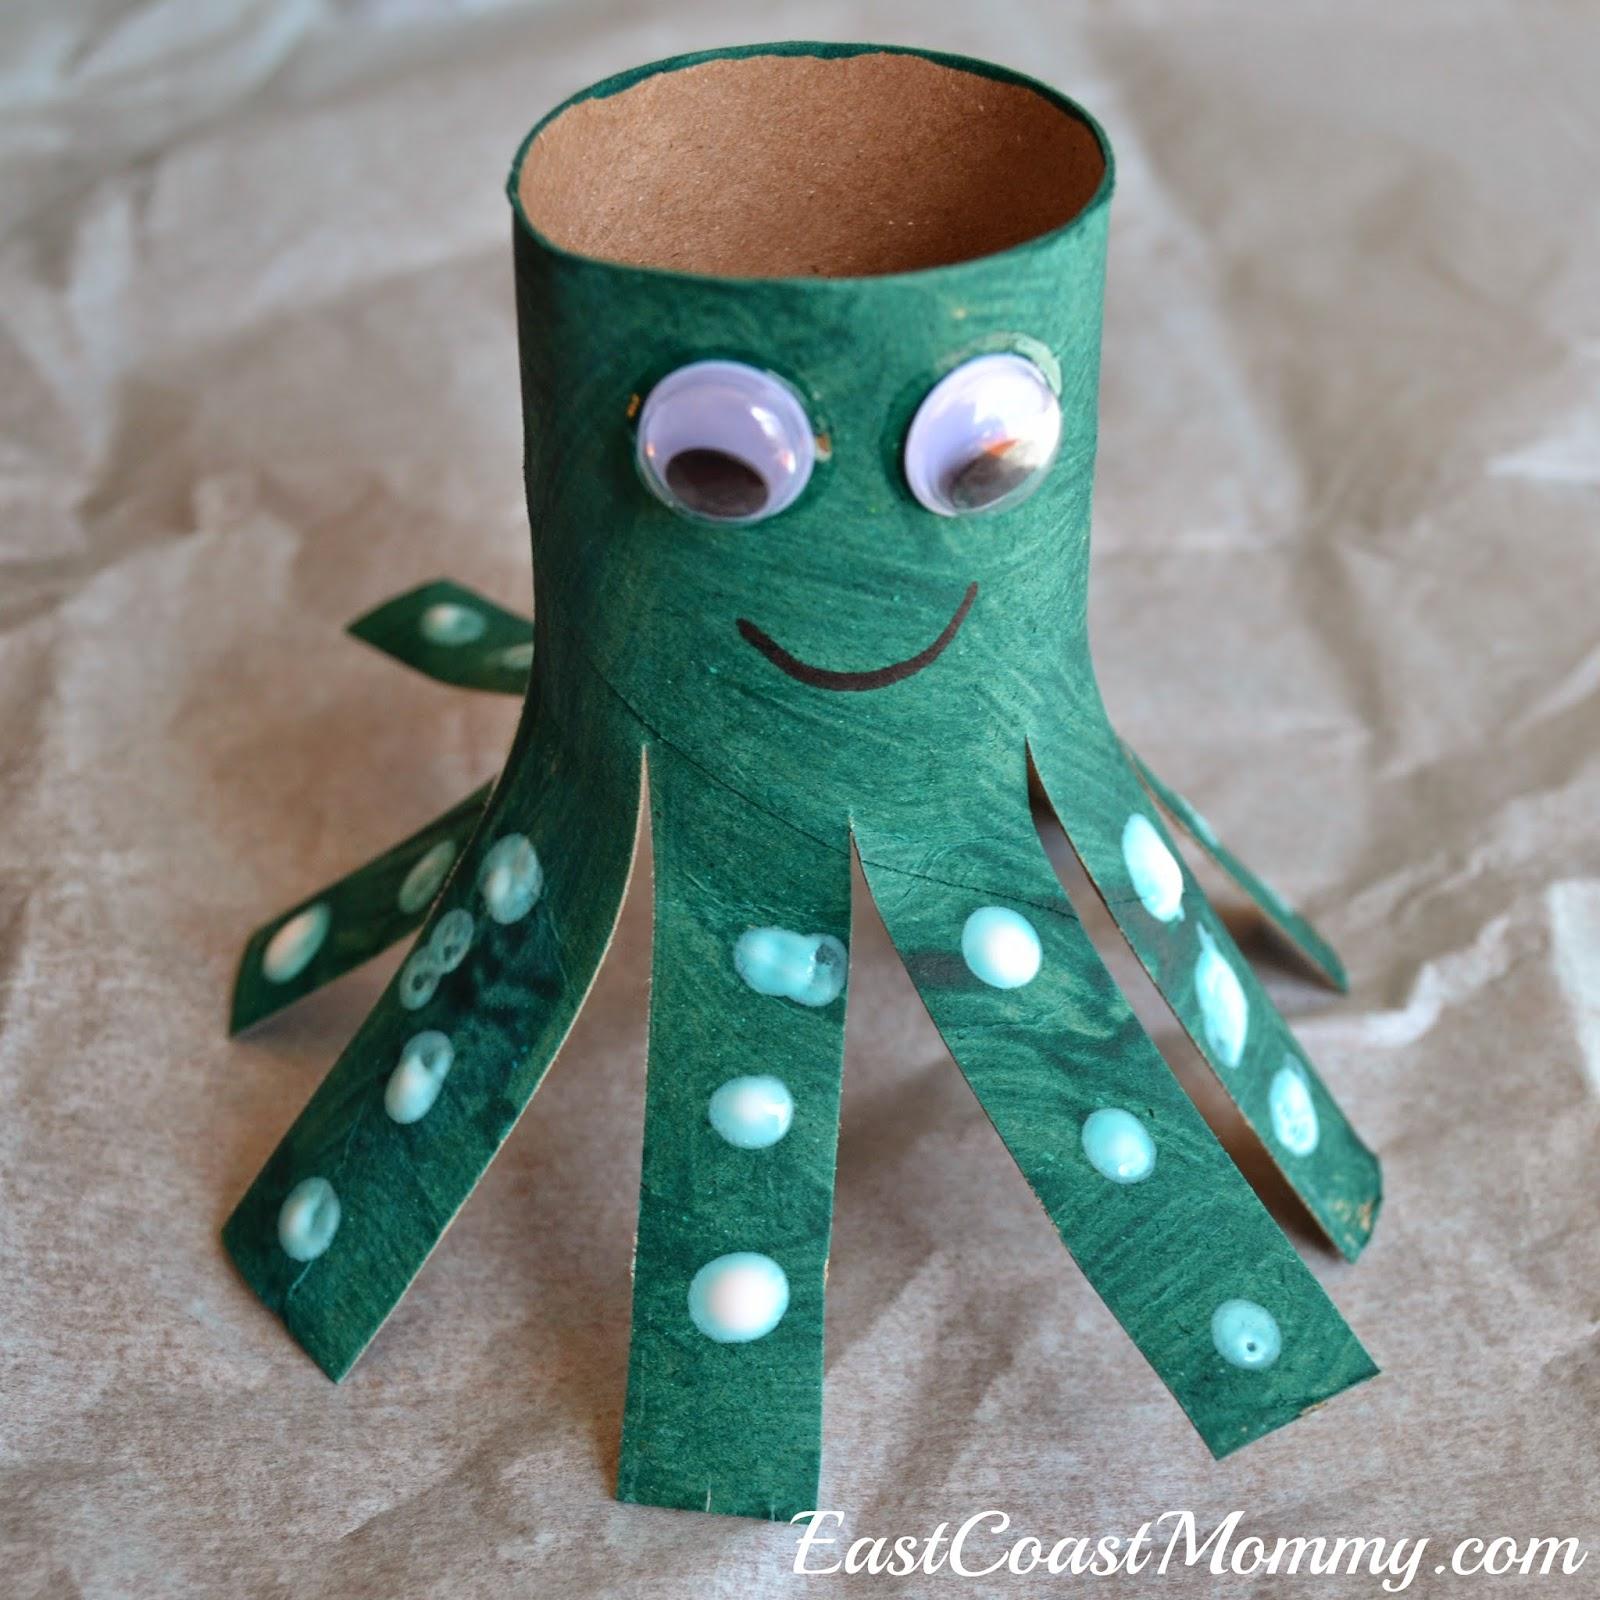 Make Construction Paper Crafts Kids